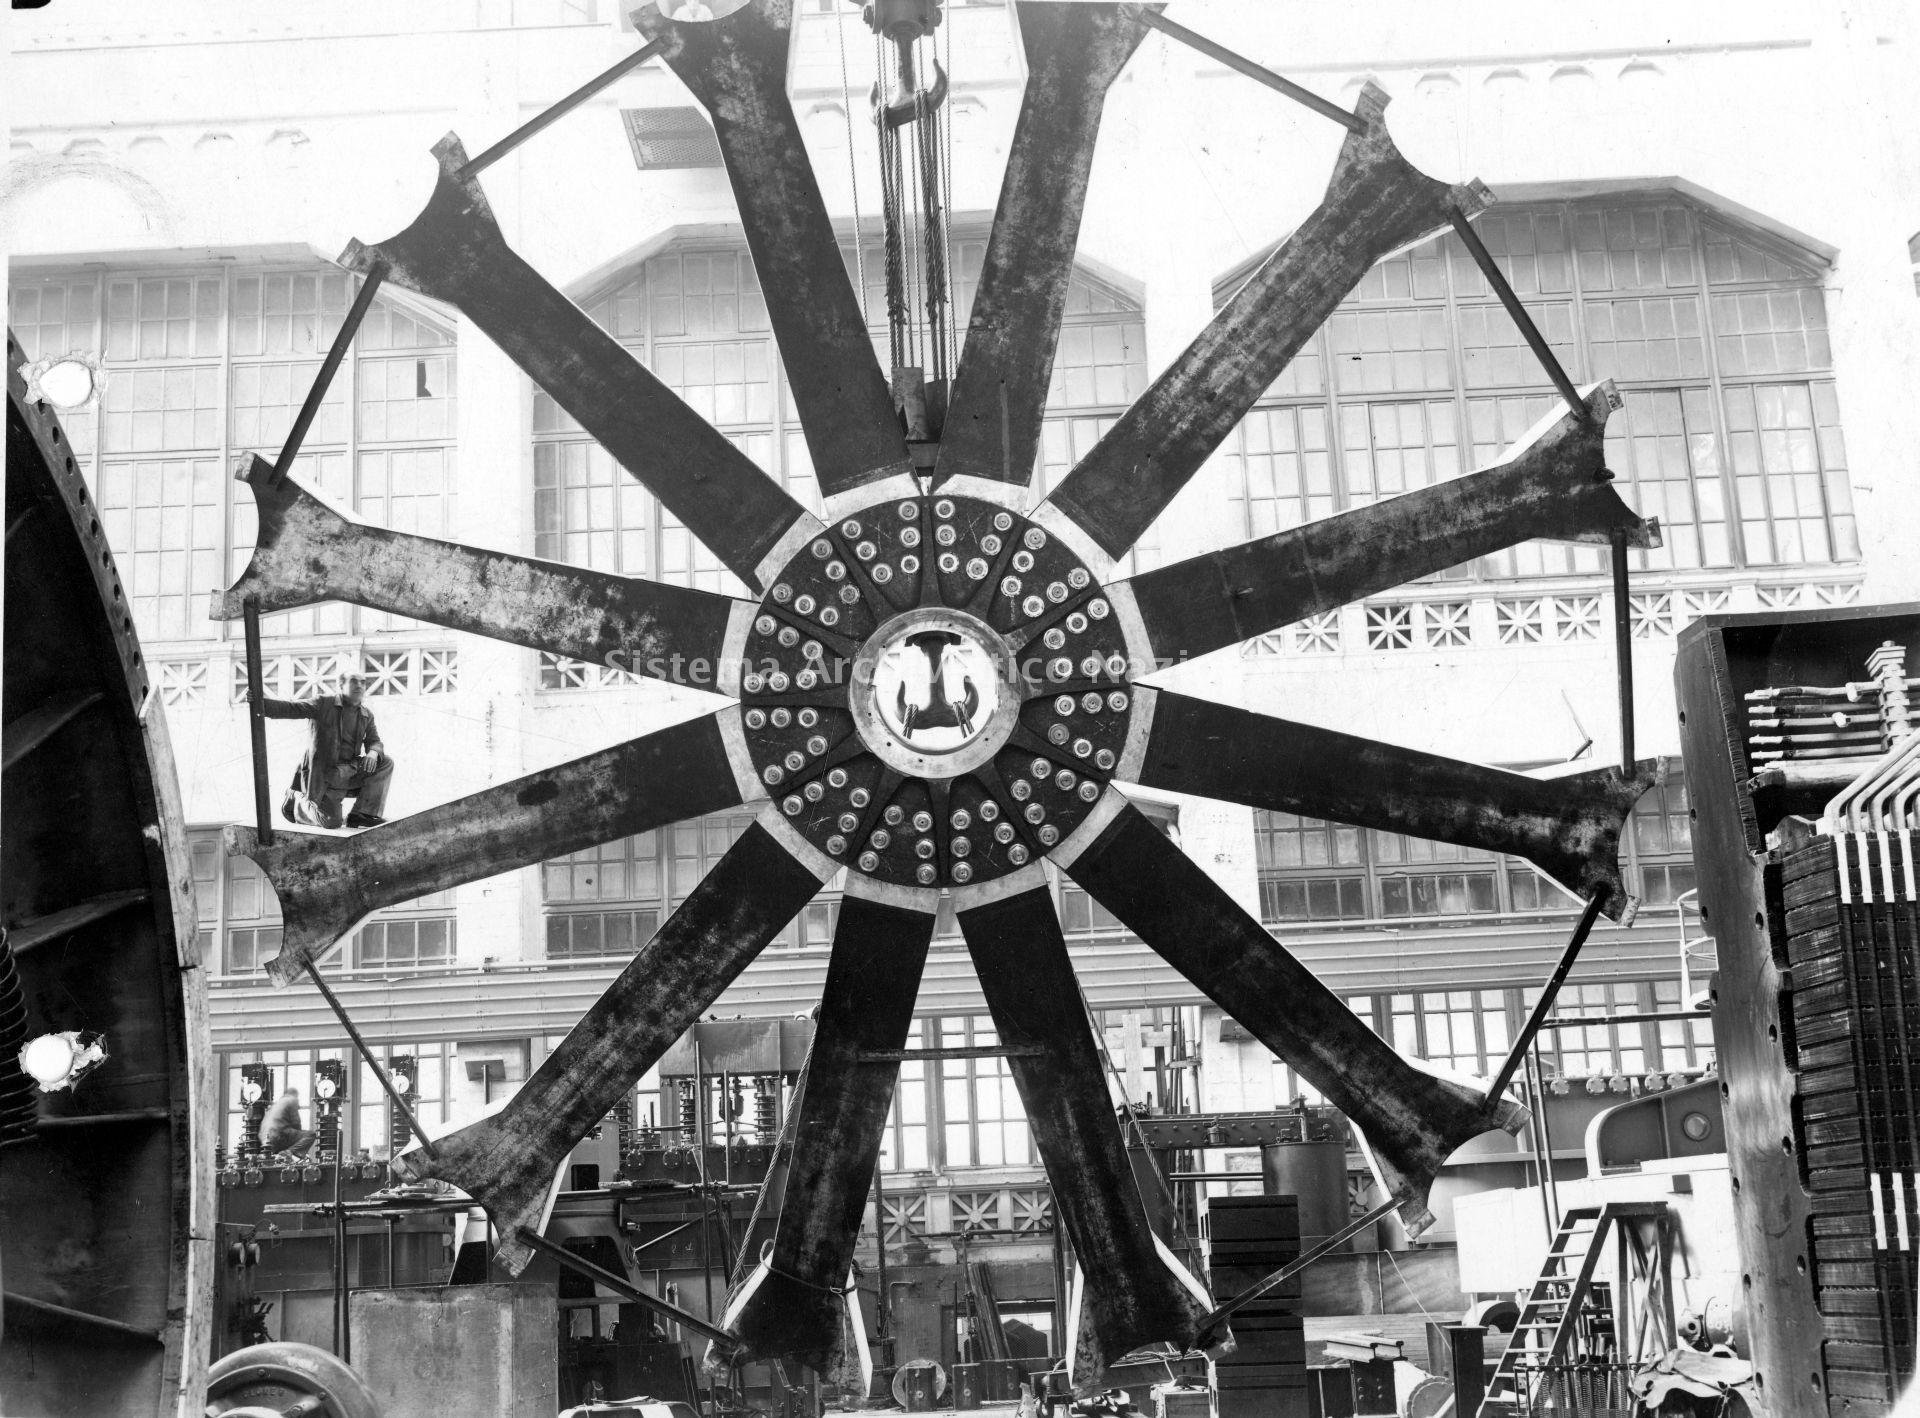 Cinema Industriale della LIUC